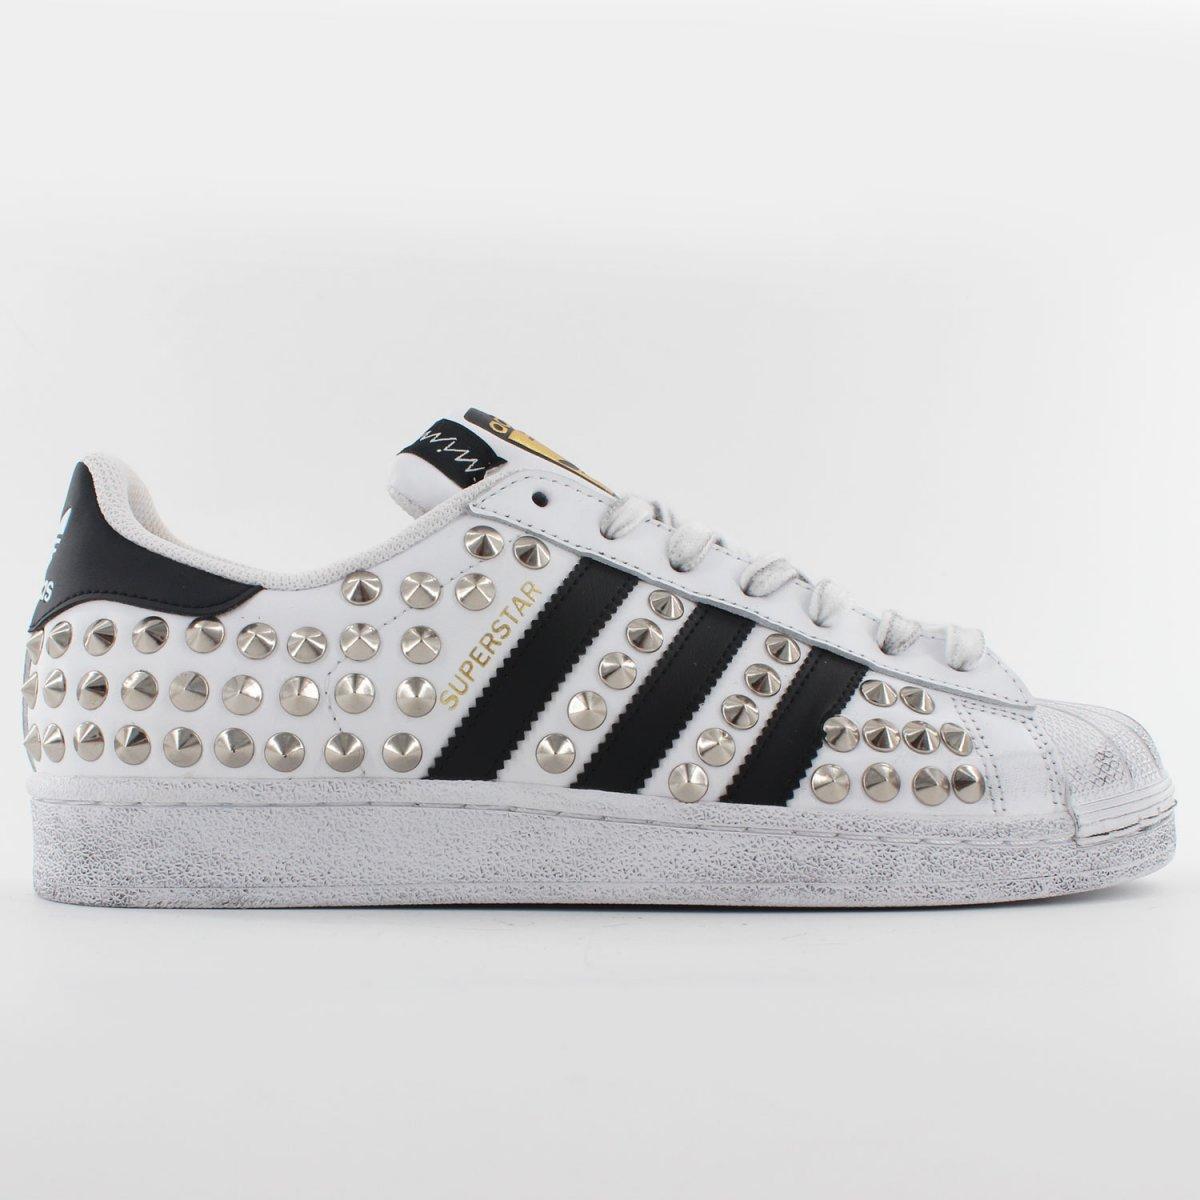 62 Best Adidas Superstar Outfit images | Adidas superstar